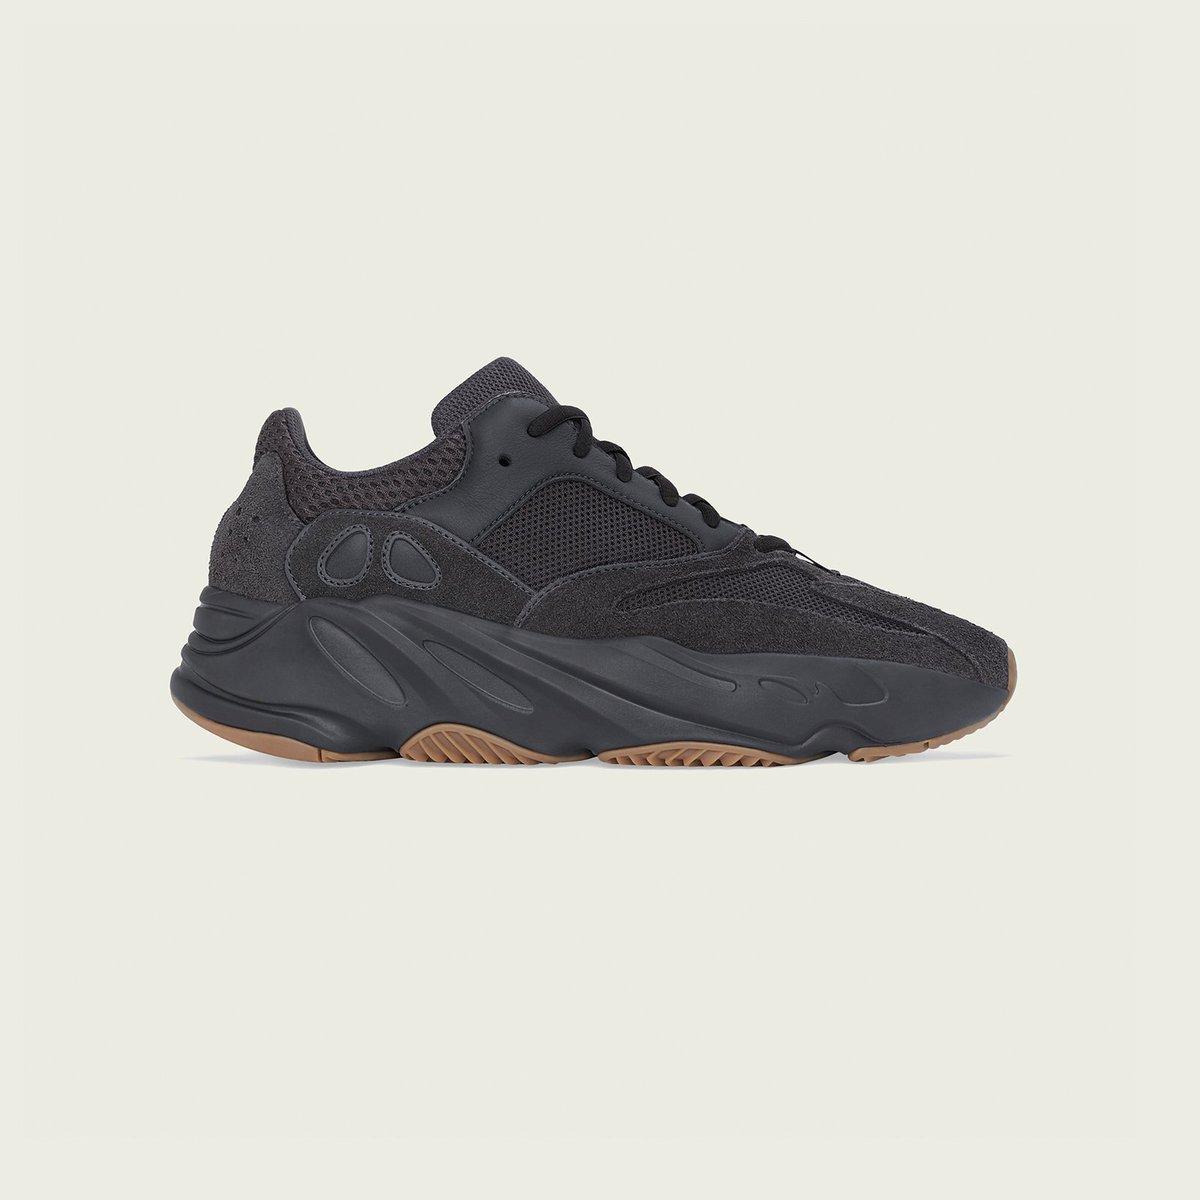 85dbdb288f7 Sneakersnstuff (@sneakersnstuff) | Twitter